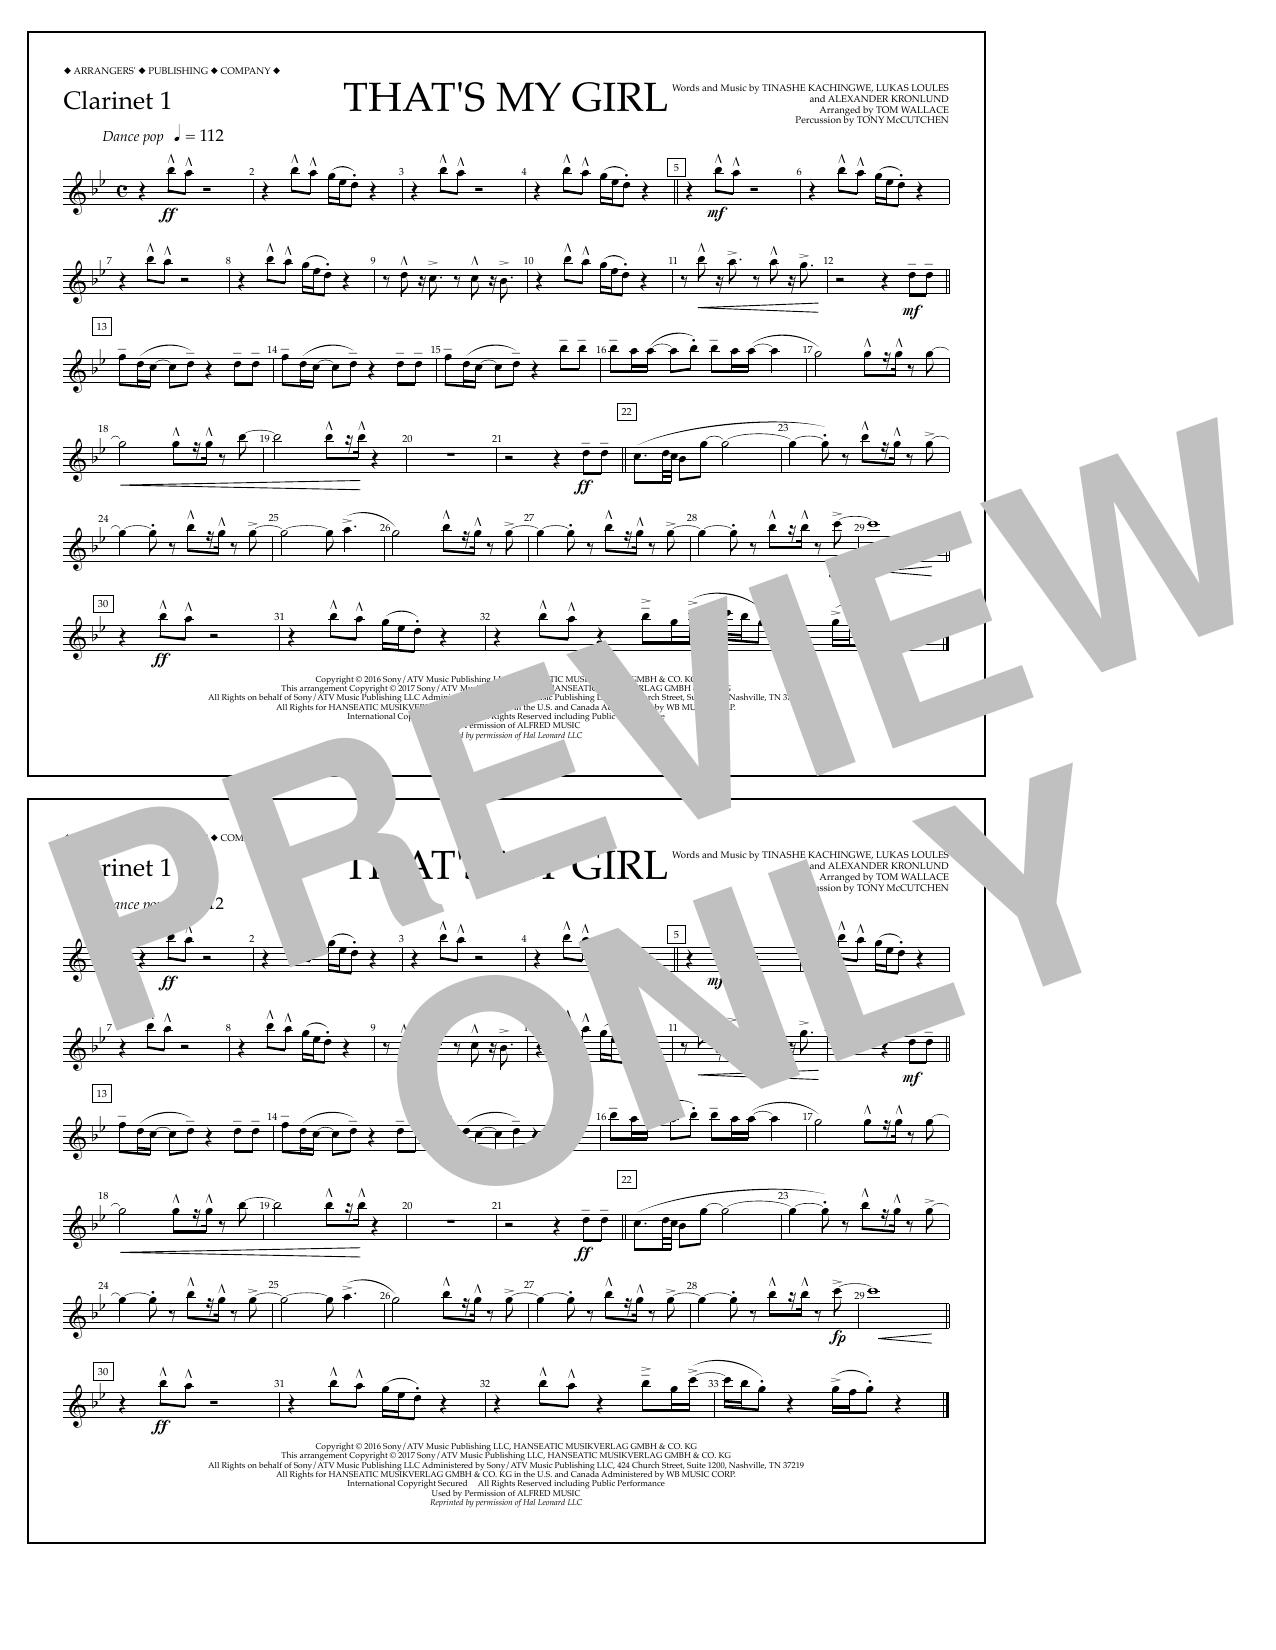 That's My Girl - Clarinet 1 Sheet Music